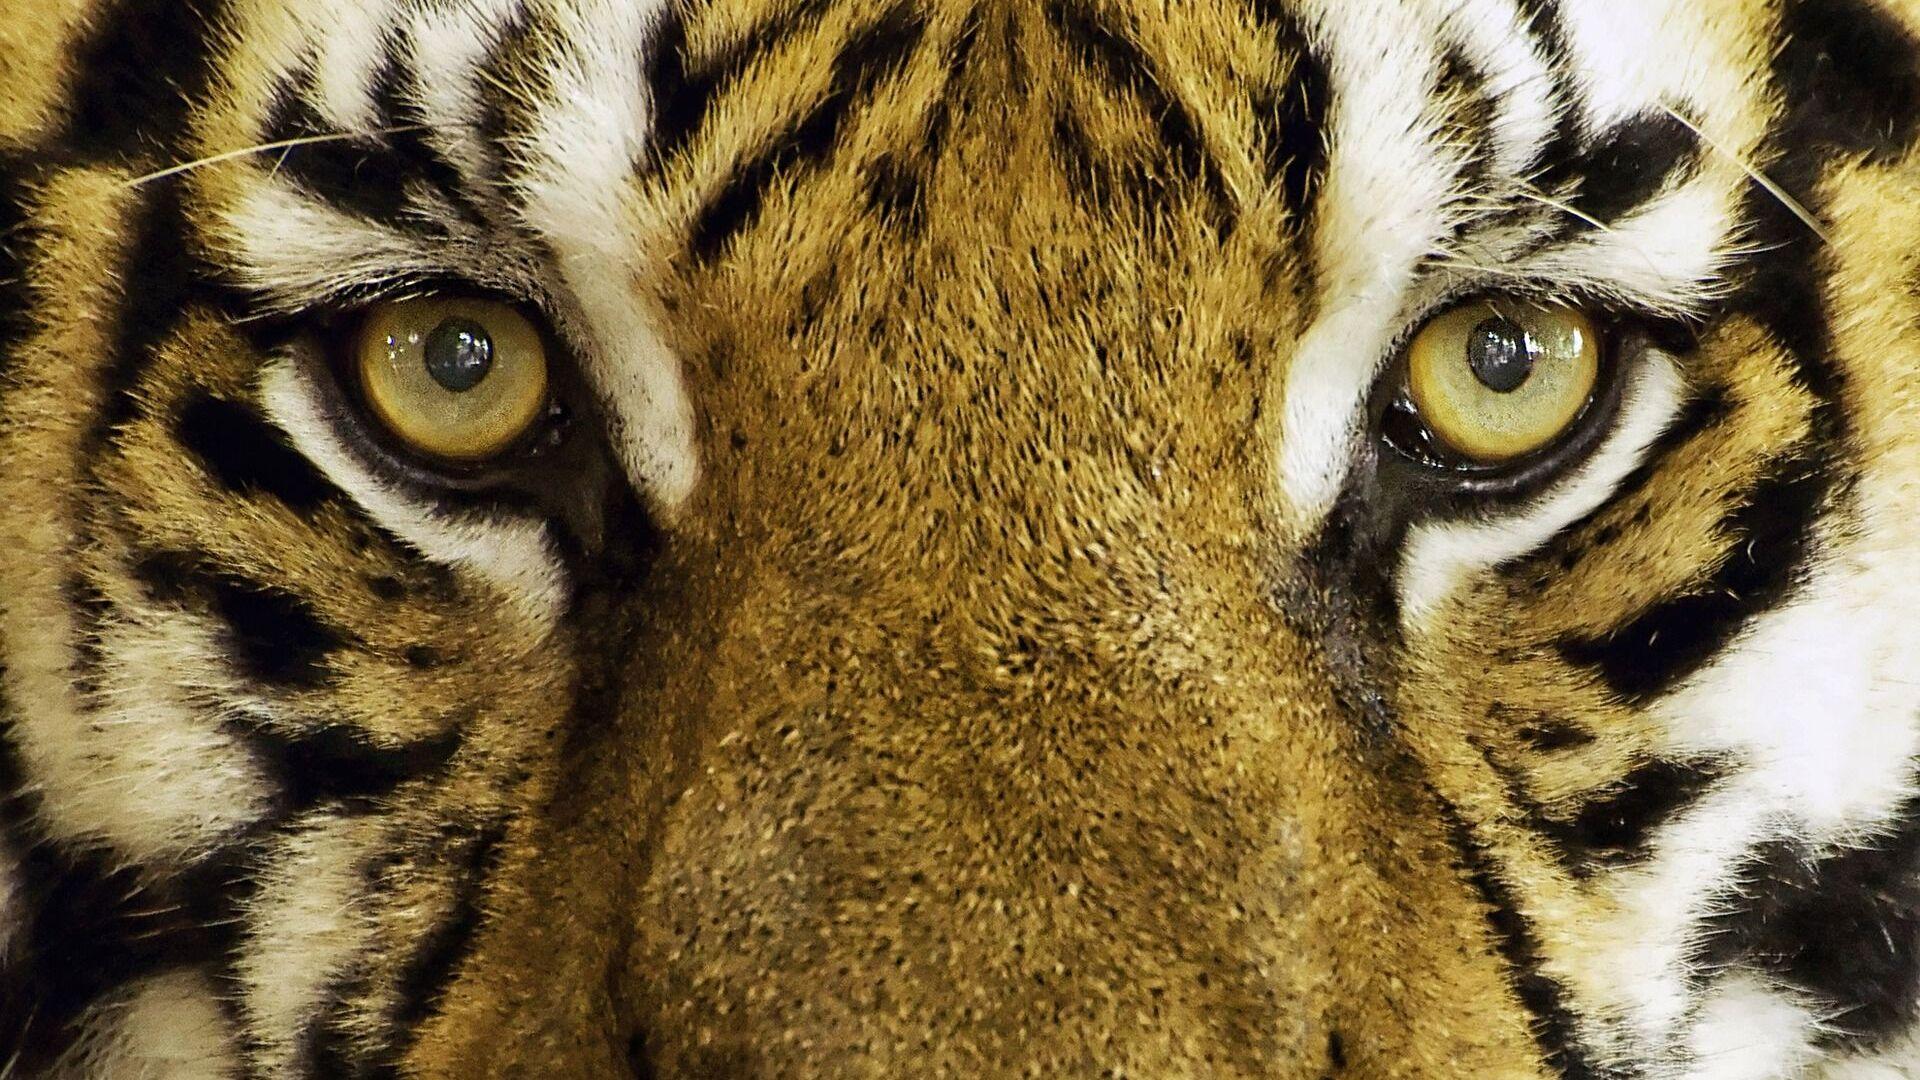 Un tigre (imagen referencial) - Sputnik Mundo, 1920, 06.08.2021